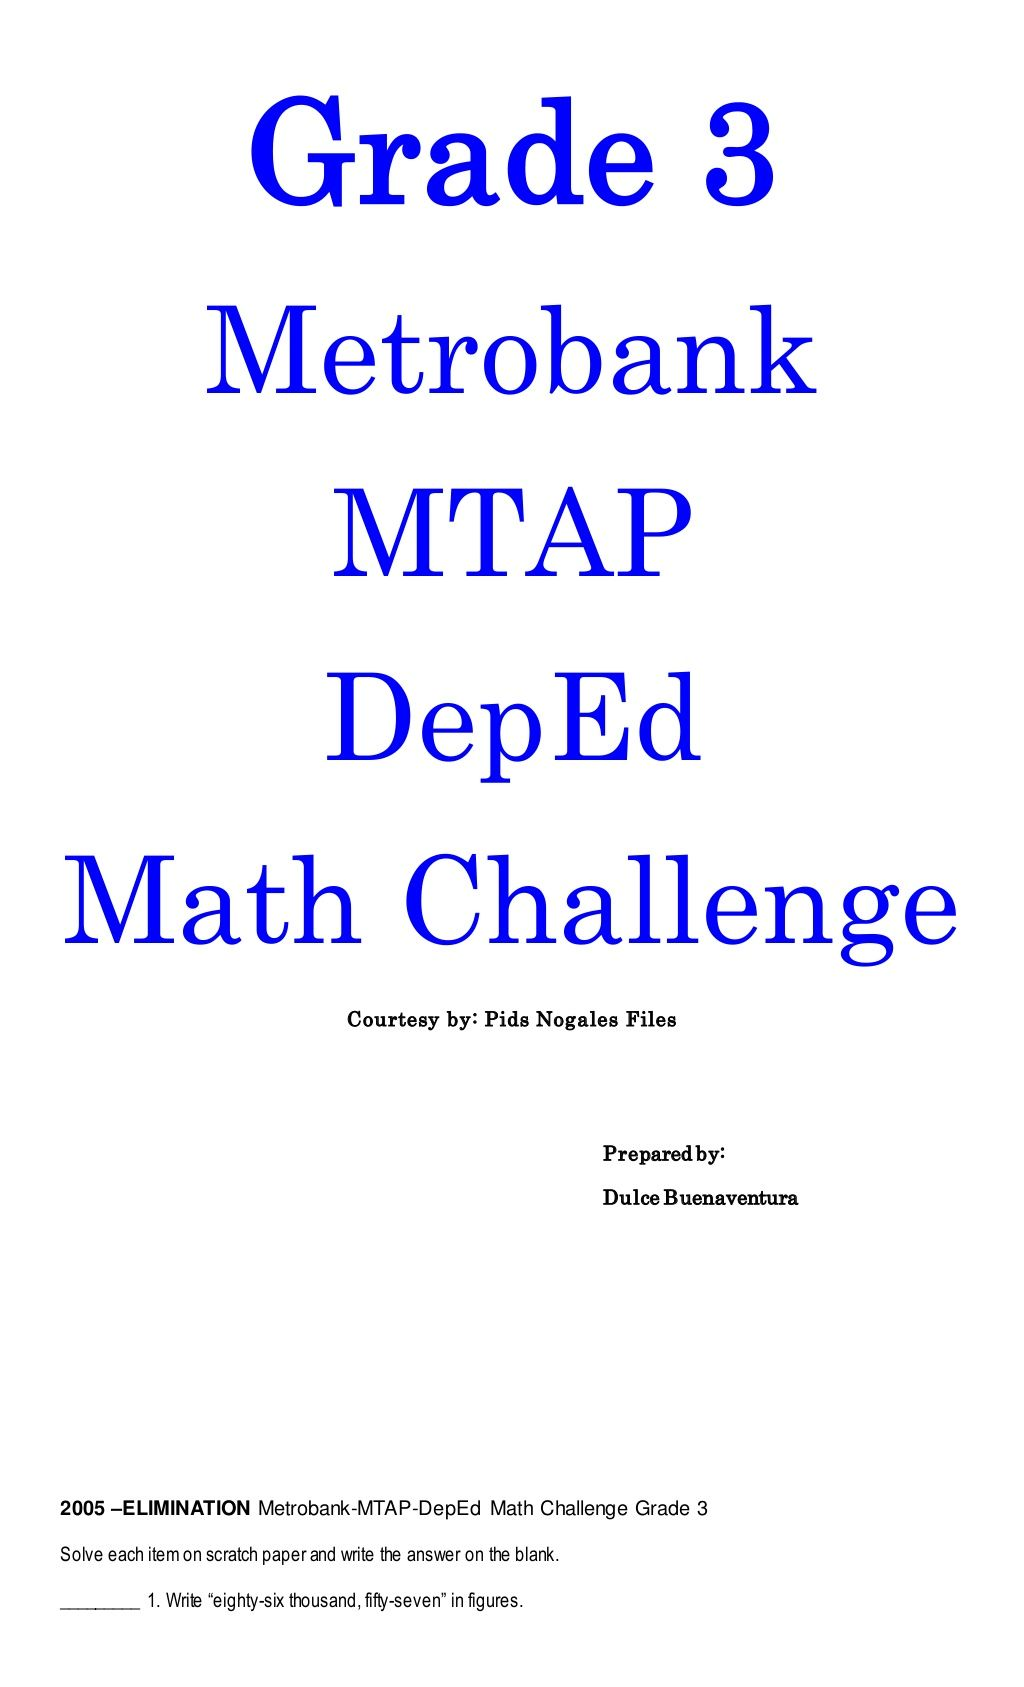 Grade 3 Metrobank MTAP DepEd Math Challenge Courtesy by: Pids Nogales Files  Prepared by: Dulce Buenaventura 2005 –EL…   Math challenge [ 1687 x 1024 Pixel ]